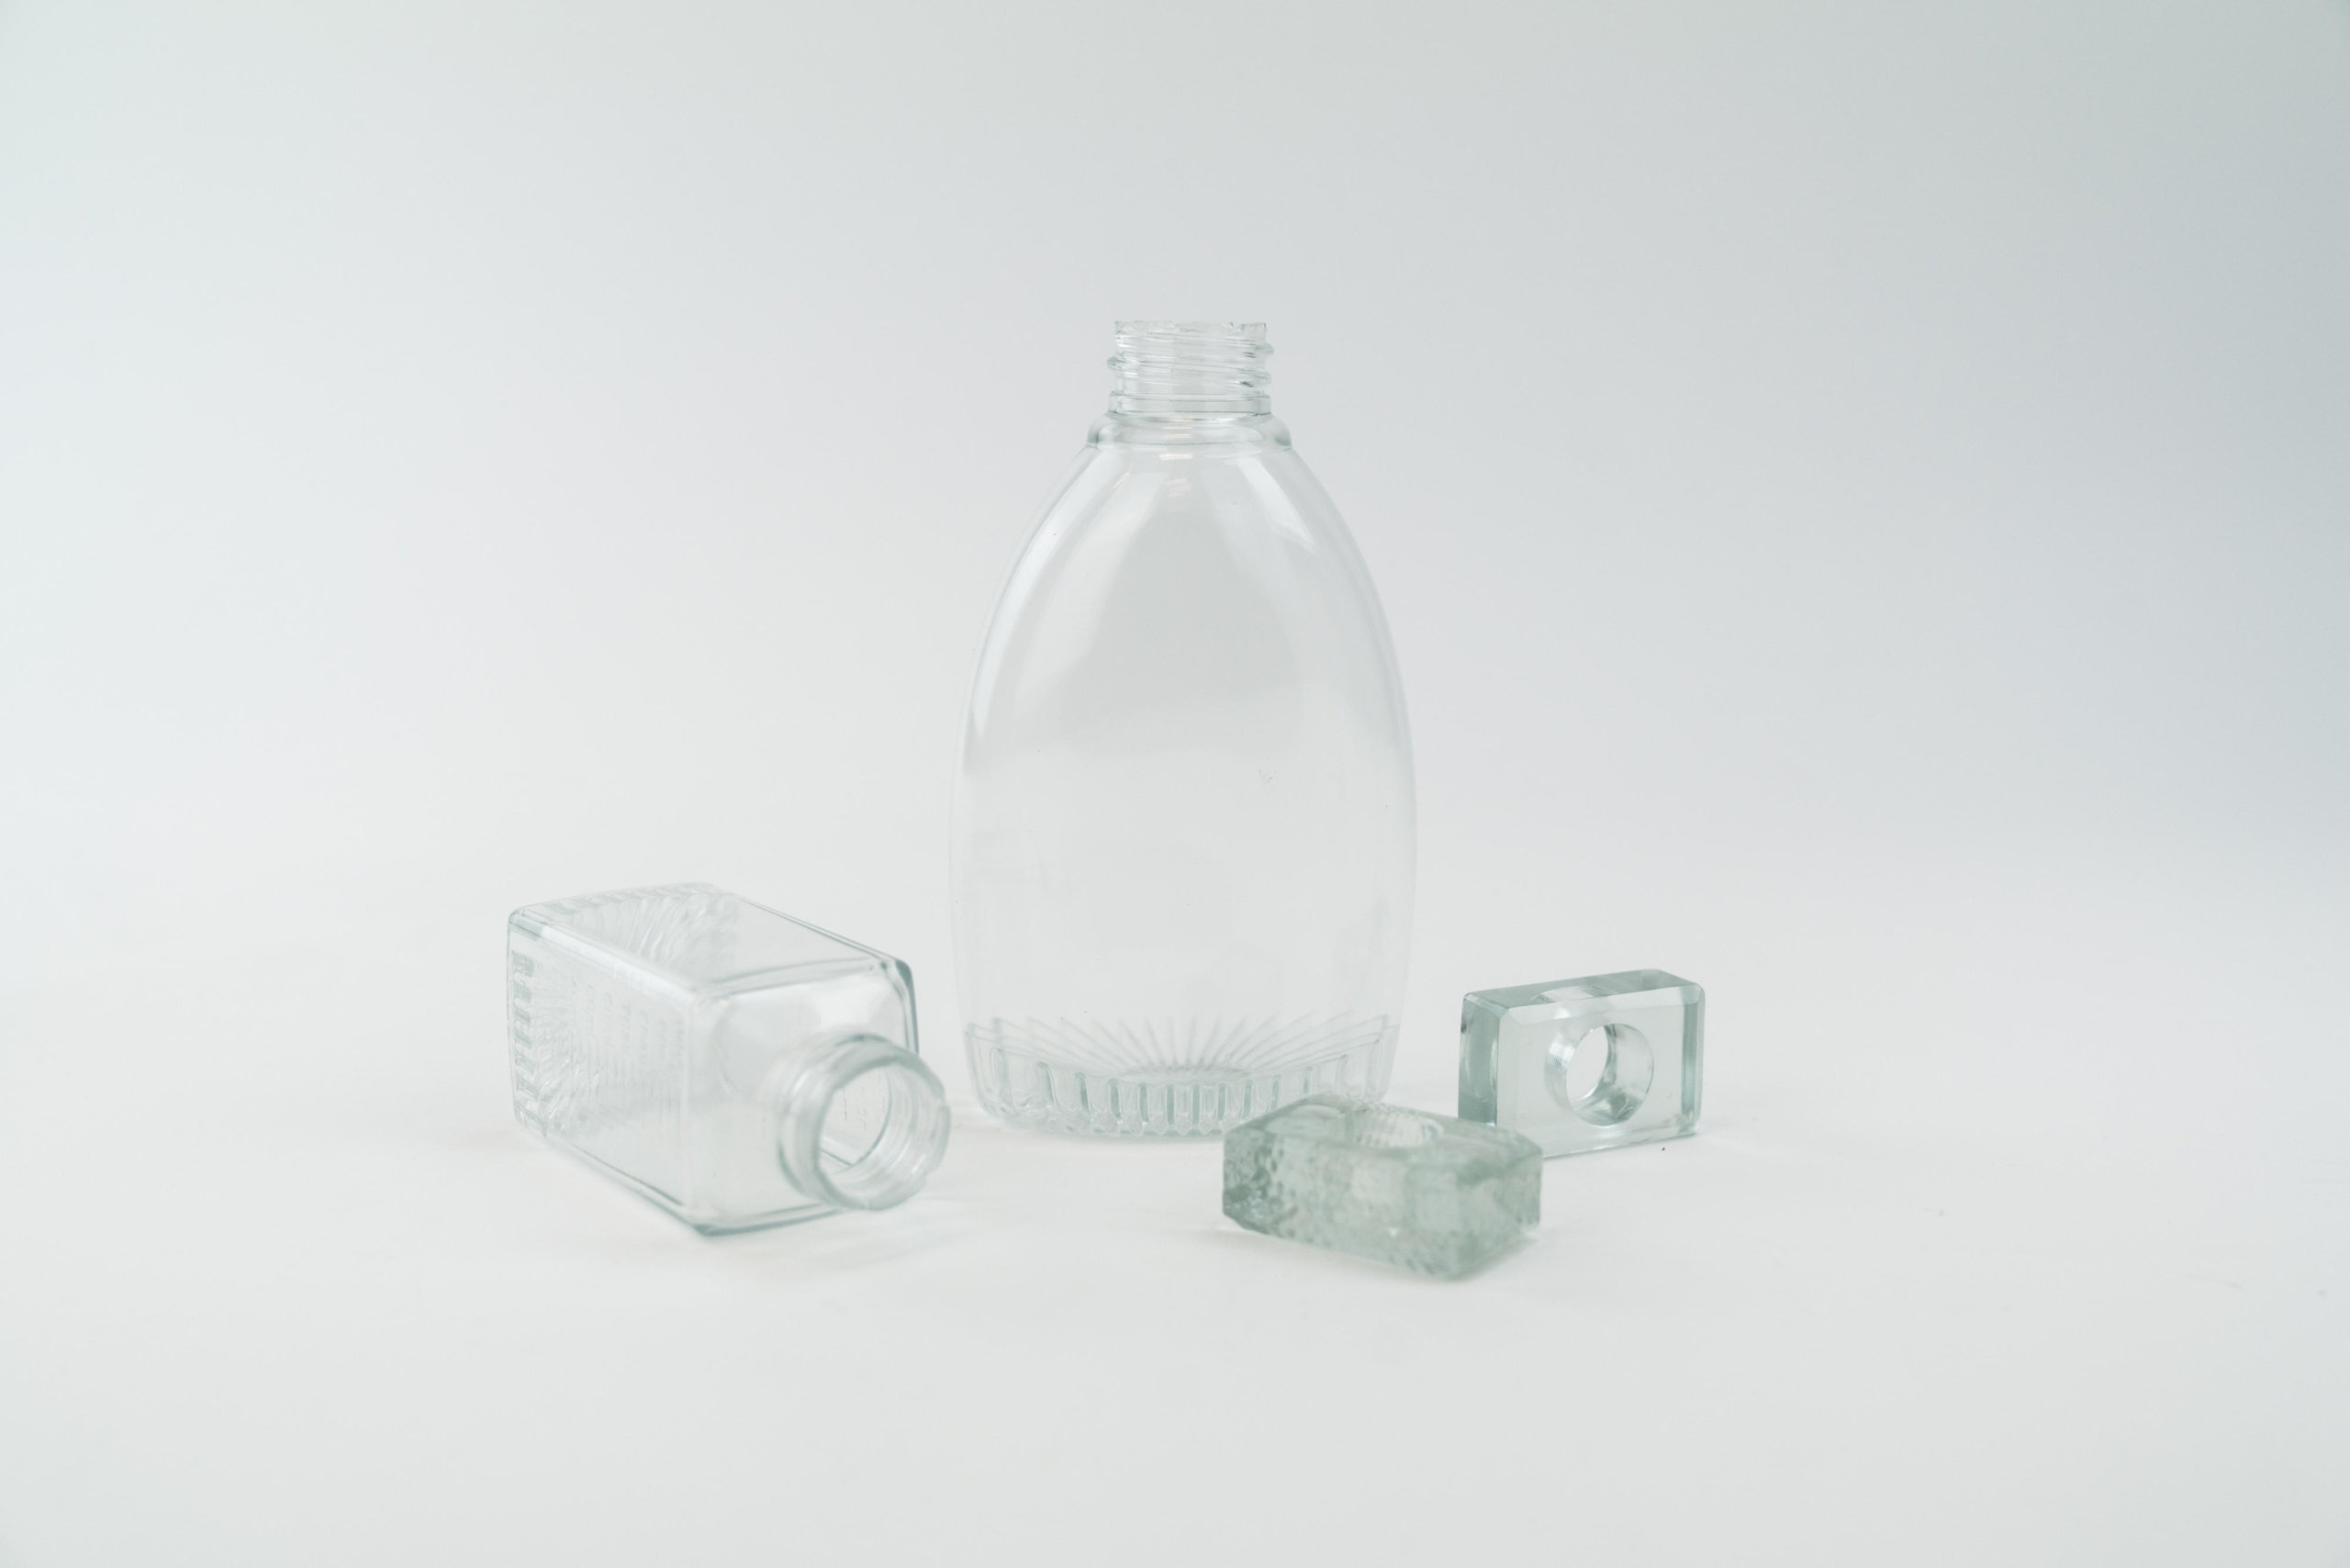 3D-gedruckte Objekte aus dem Material Loctite 3D IND405